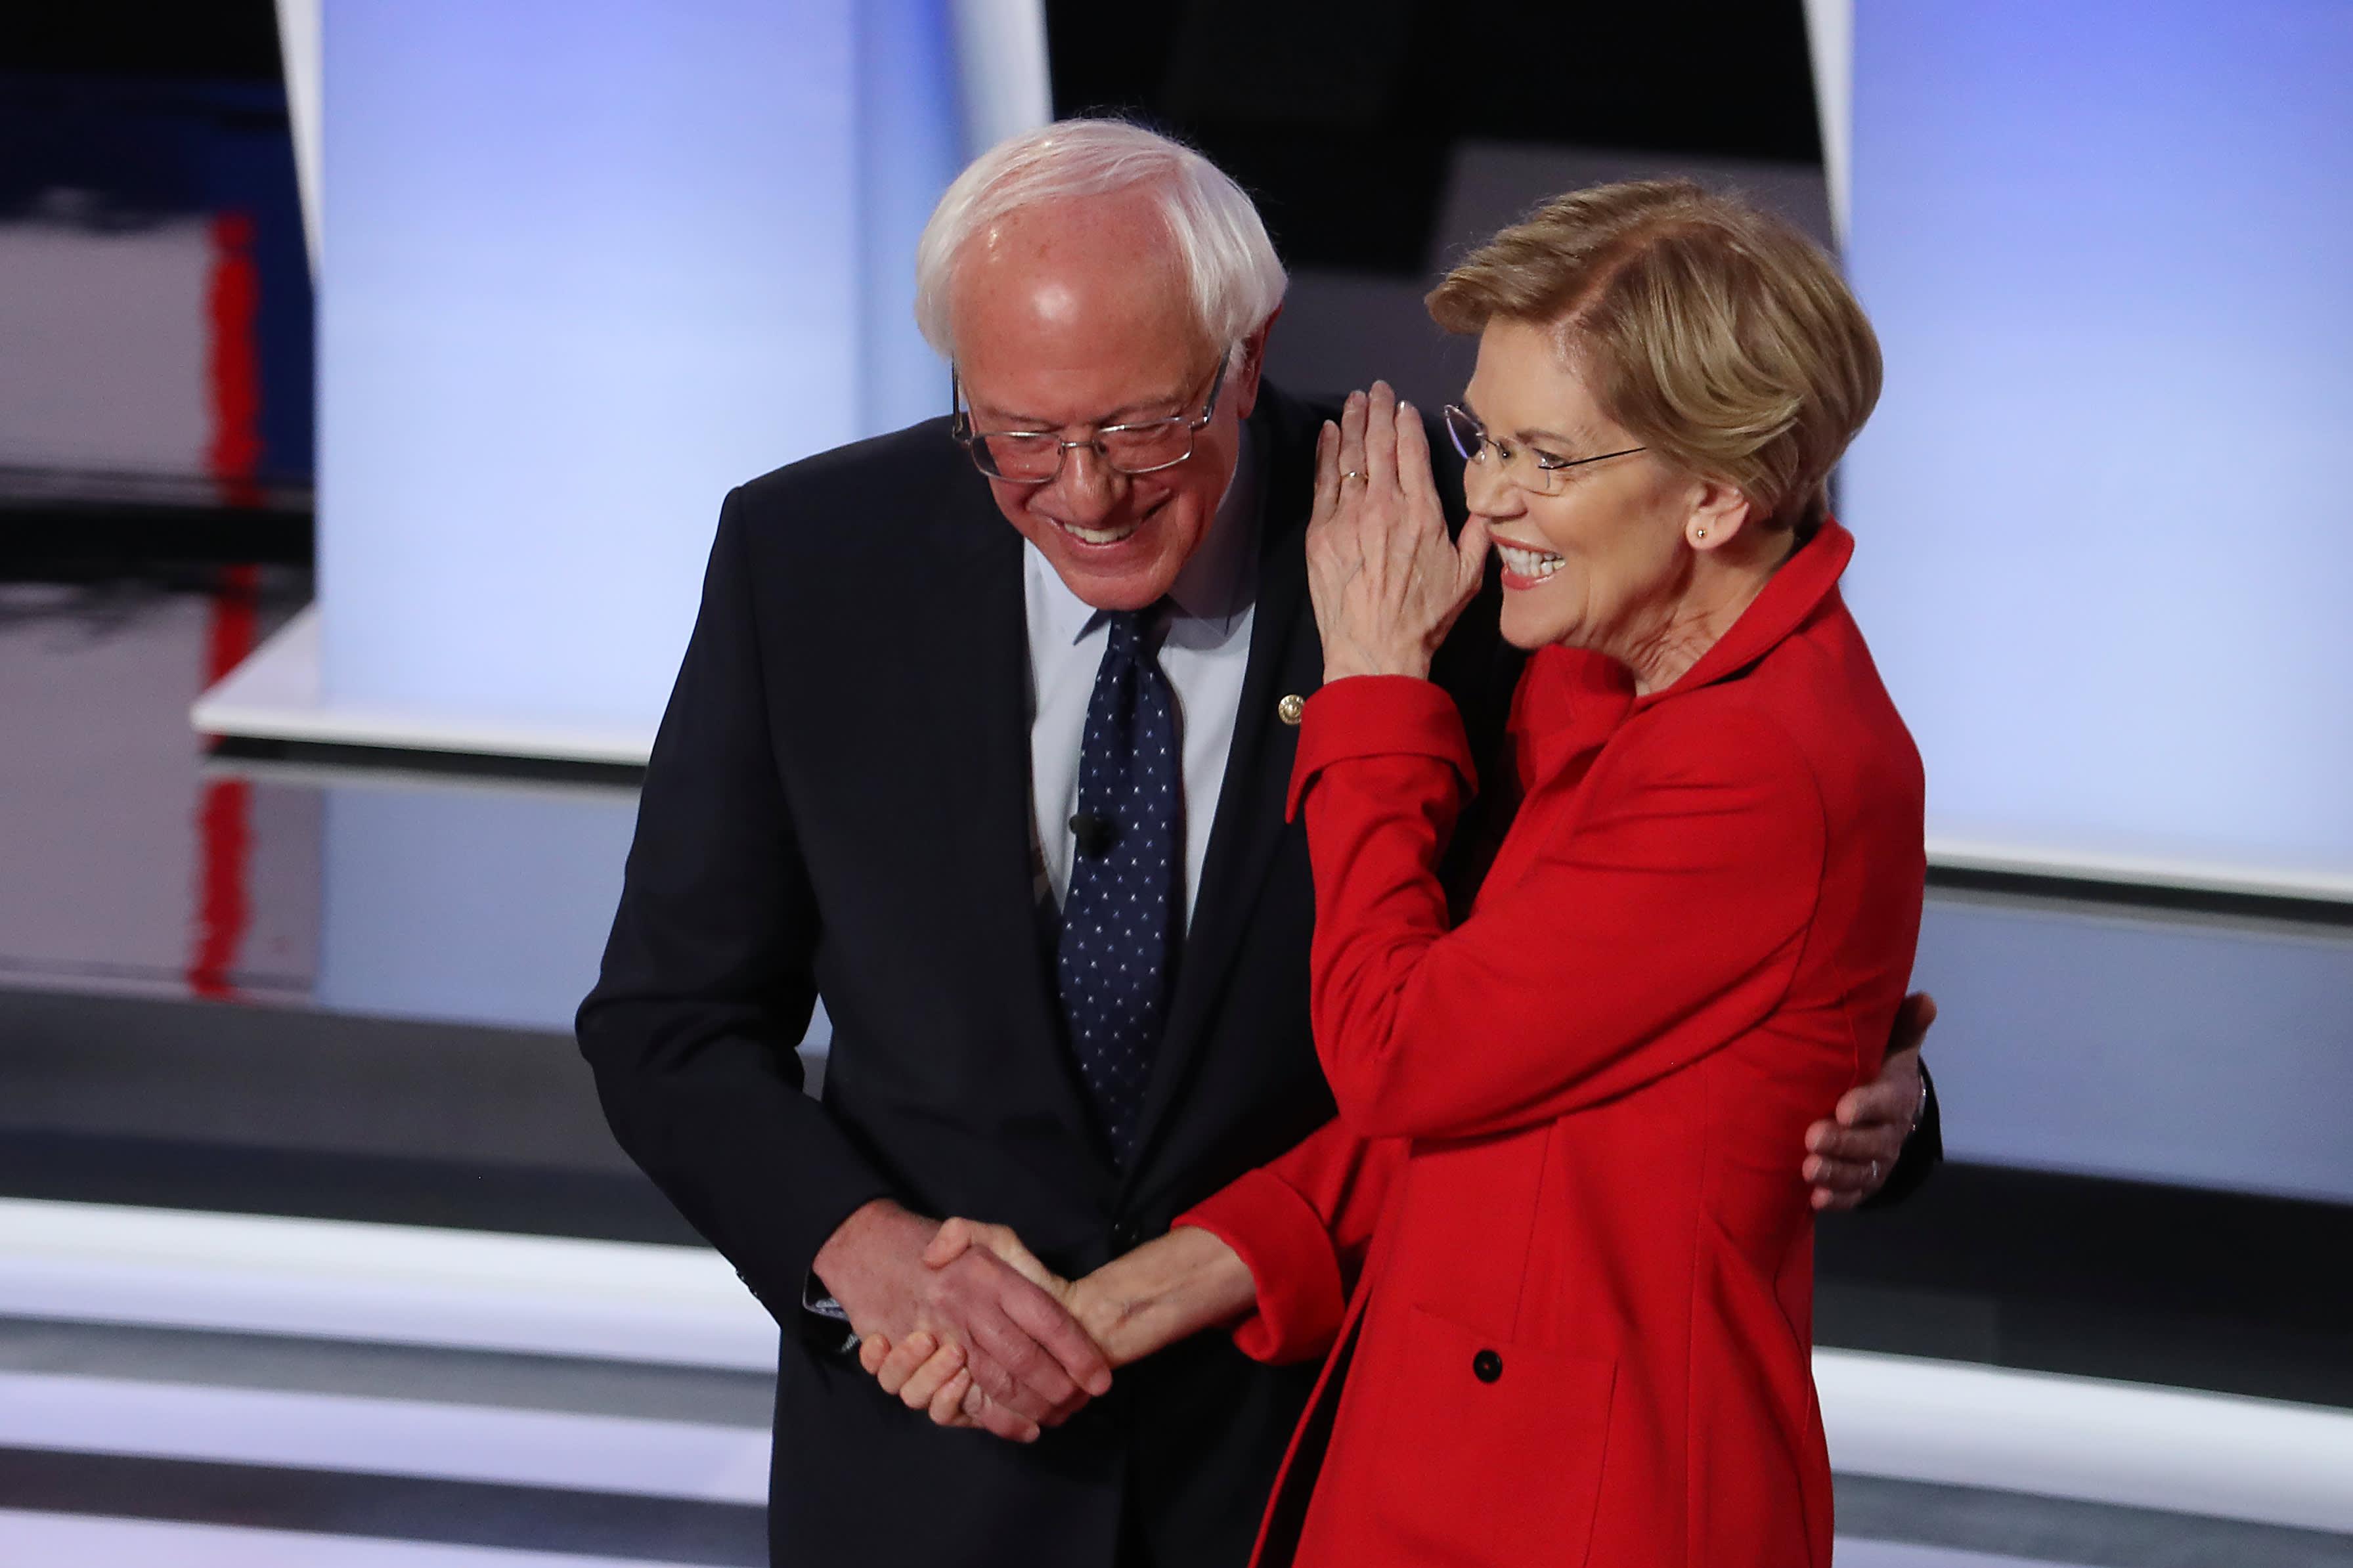 'Billionaires should not exist': Bernie Sanders tries to outdo Elizabeth Warren with tougher wealth tax proposal